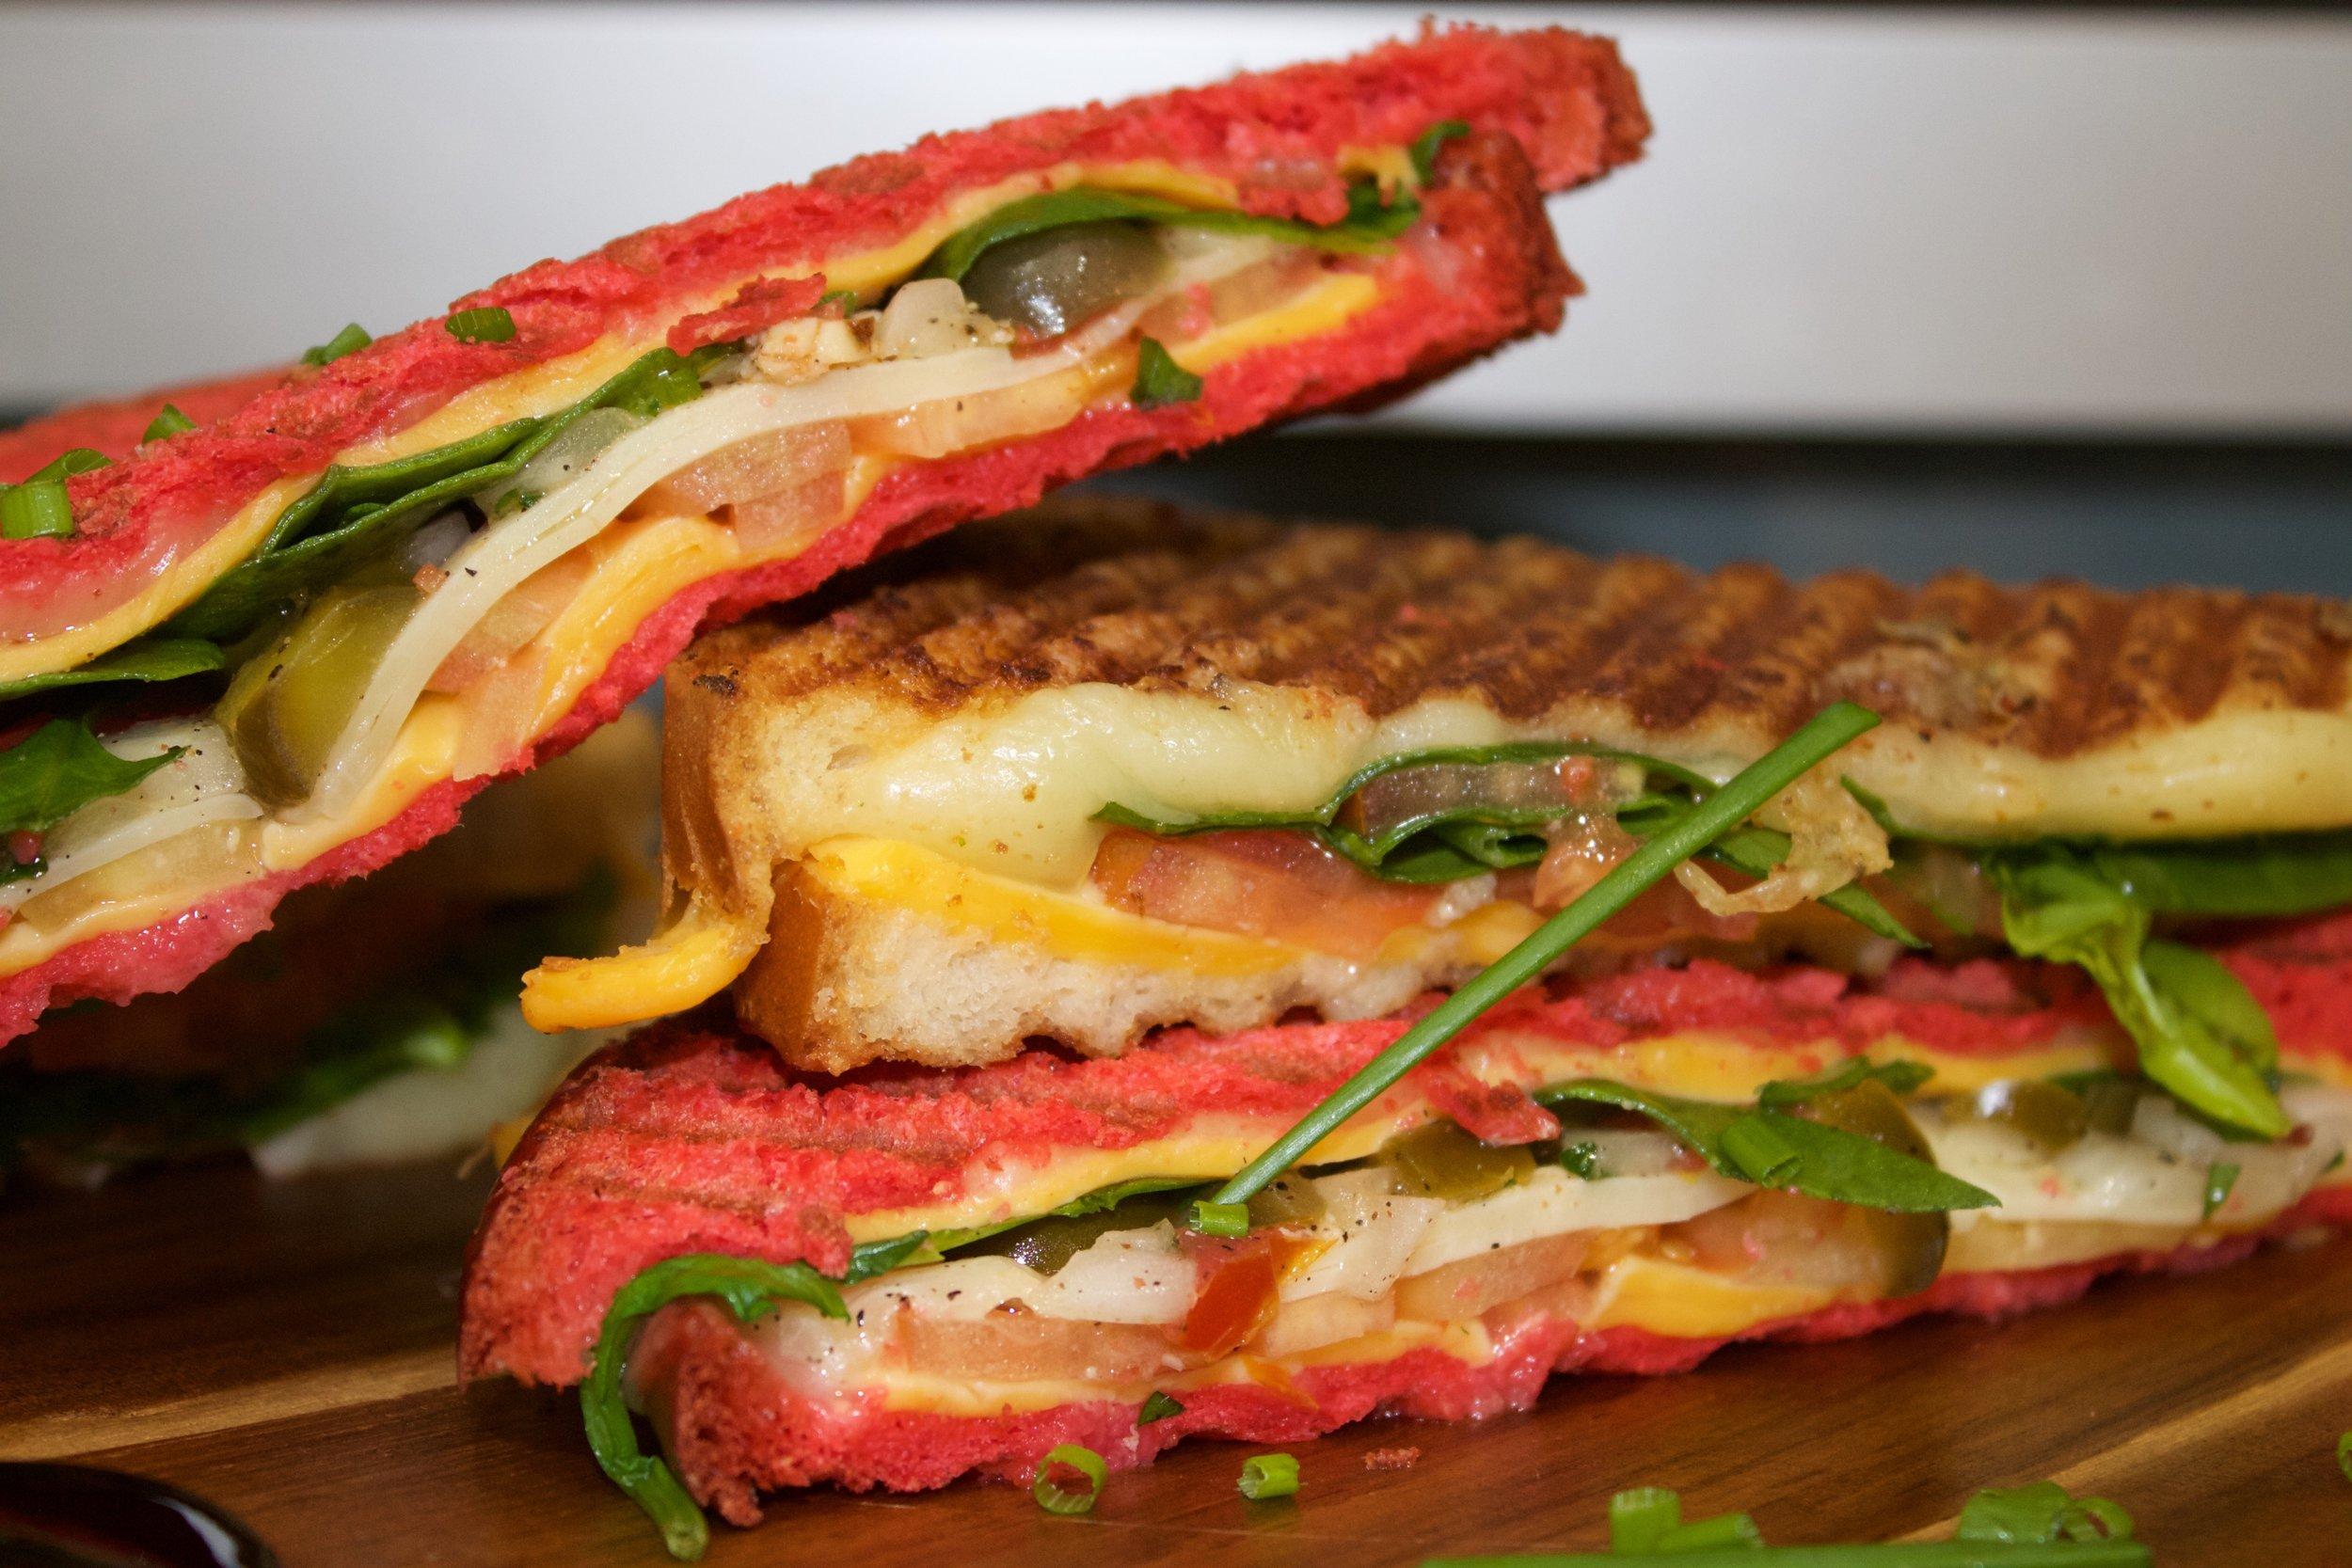 Piece-of-Velvet-Grilled-Sandwich.jpg